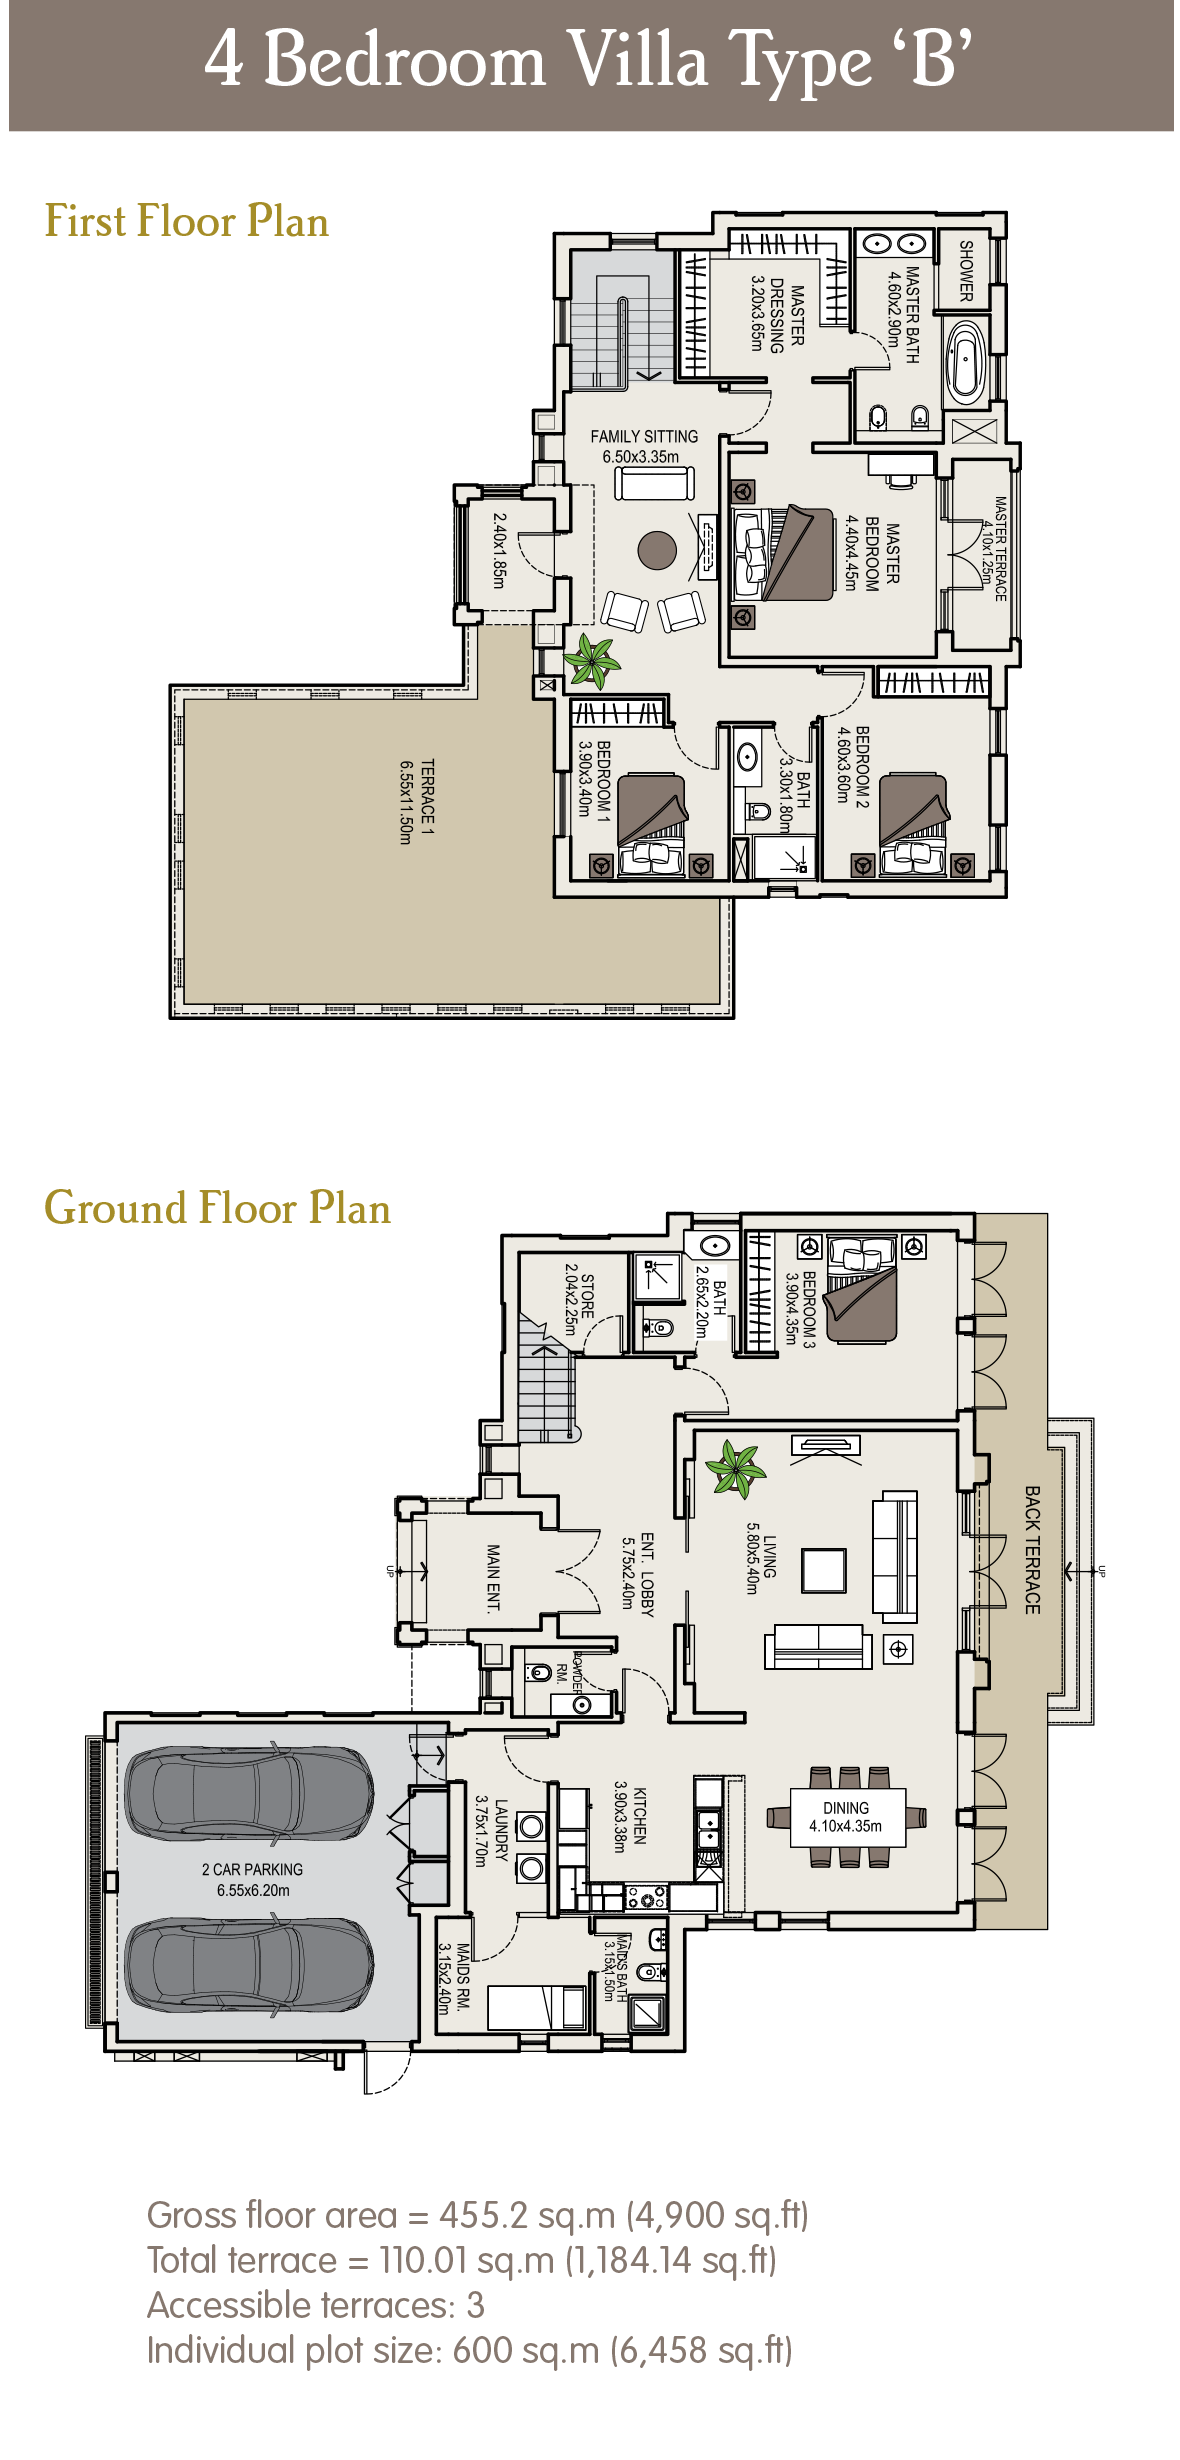 4Bedroom-Villas-TypeB